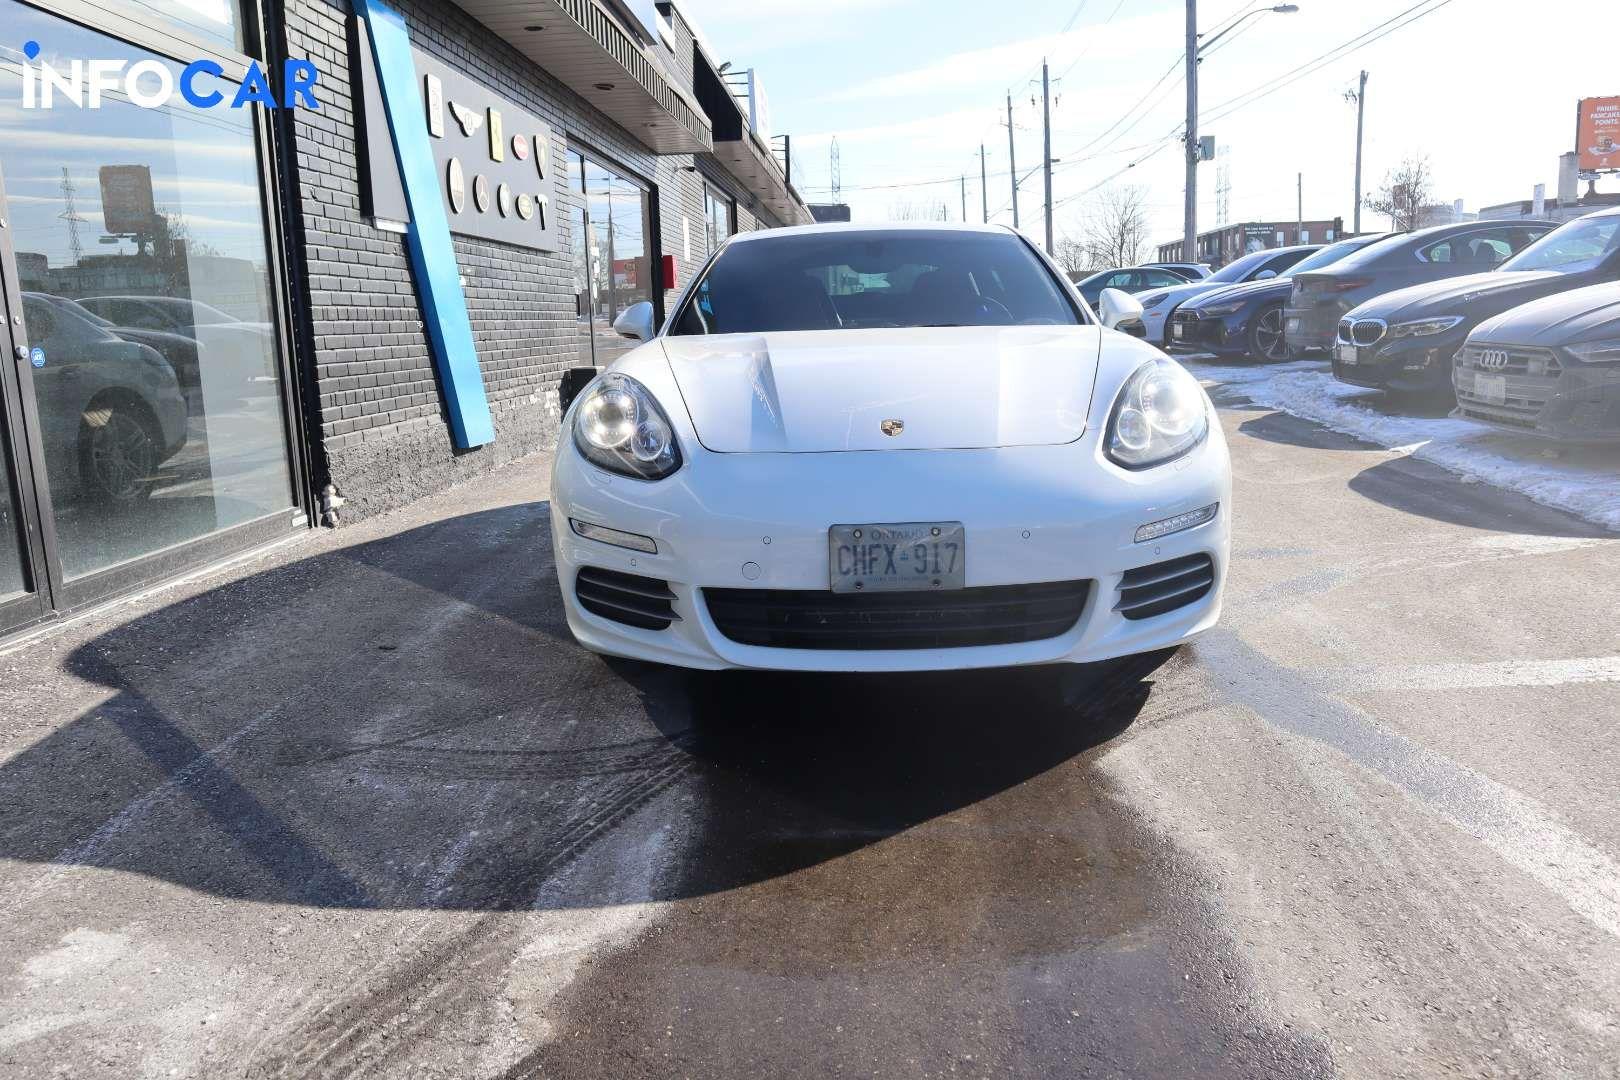 2015 Porsche Panamera 4 - INFOCAR - Toronto's Most Comprehensive New and Used Auto Trading Platform